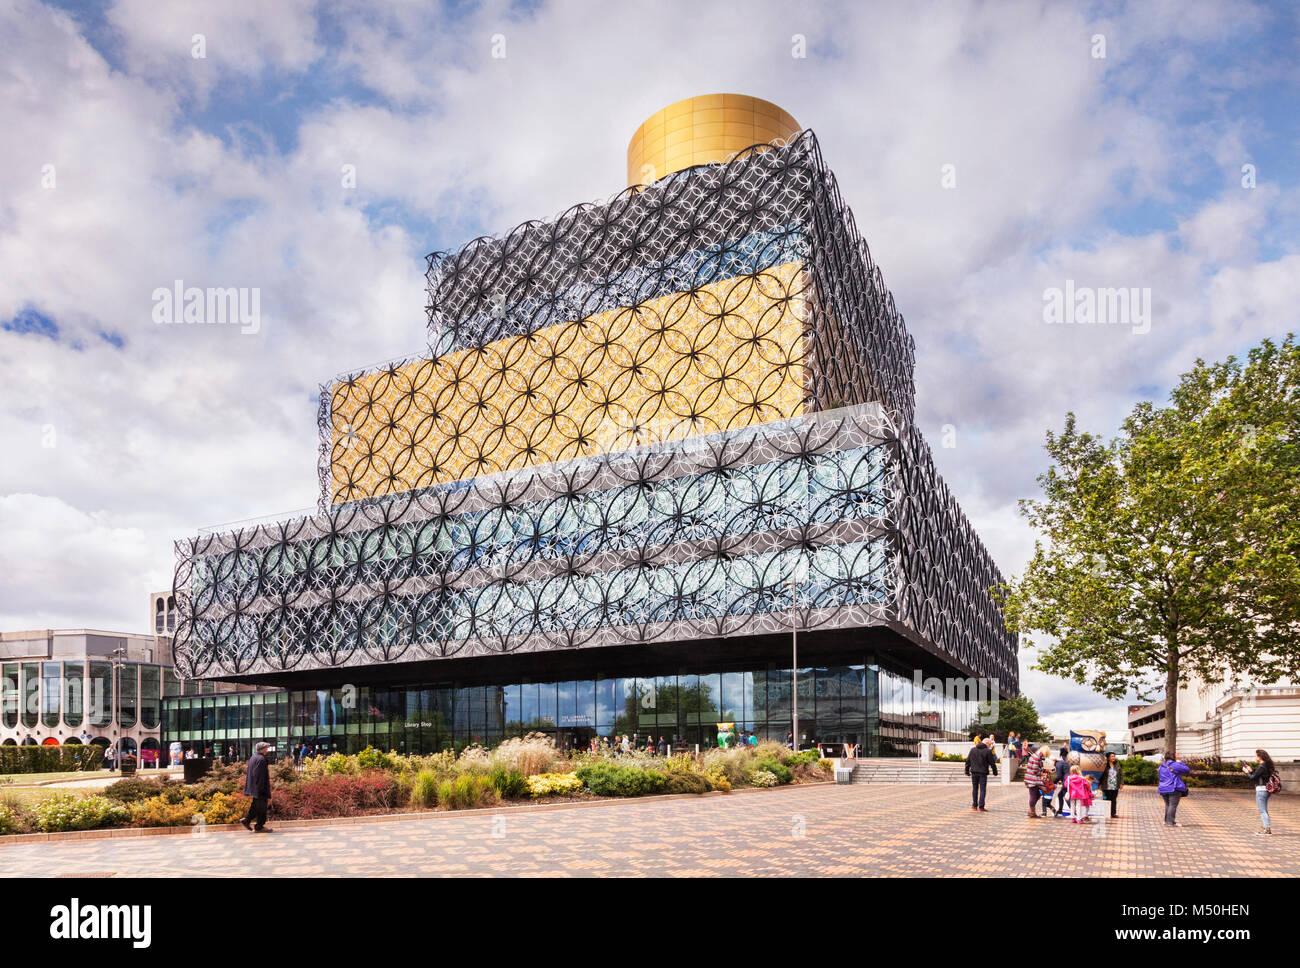 Birmingham Public Library, von Mecanoo, Birmingham, West Midlands, England Stockfoto